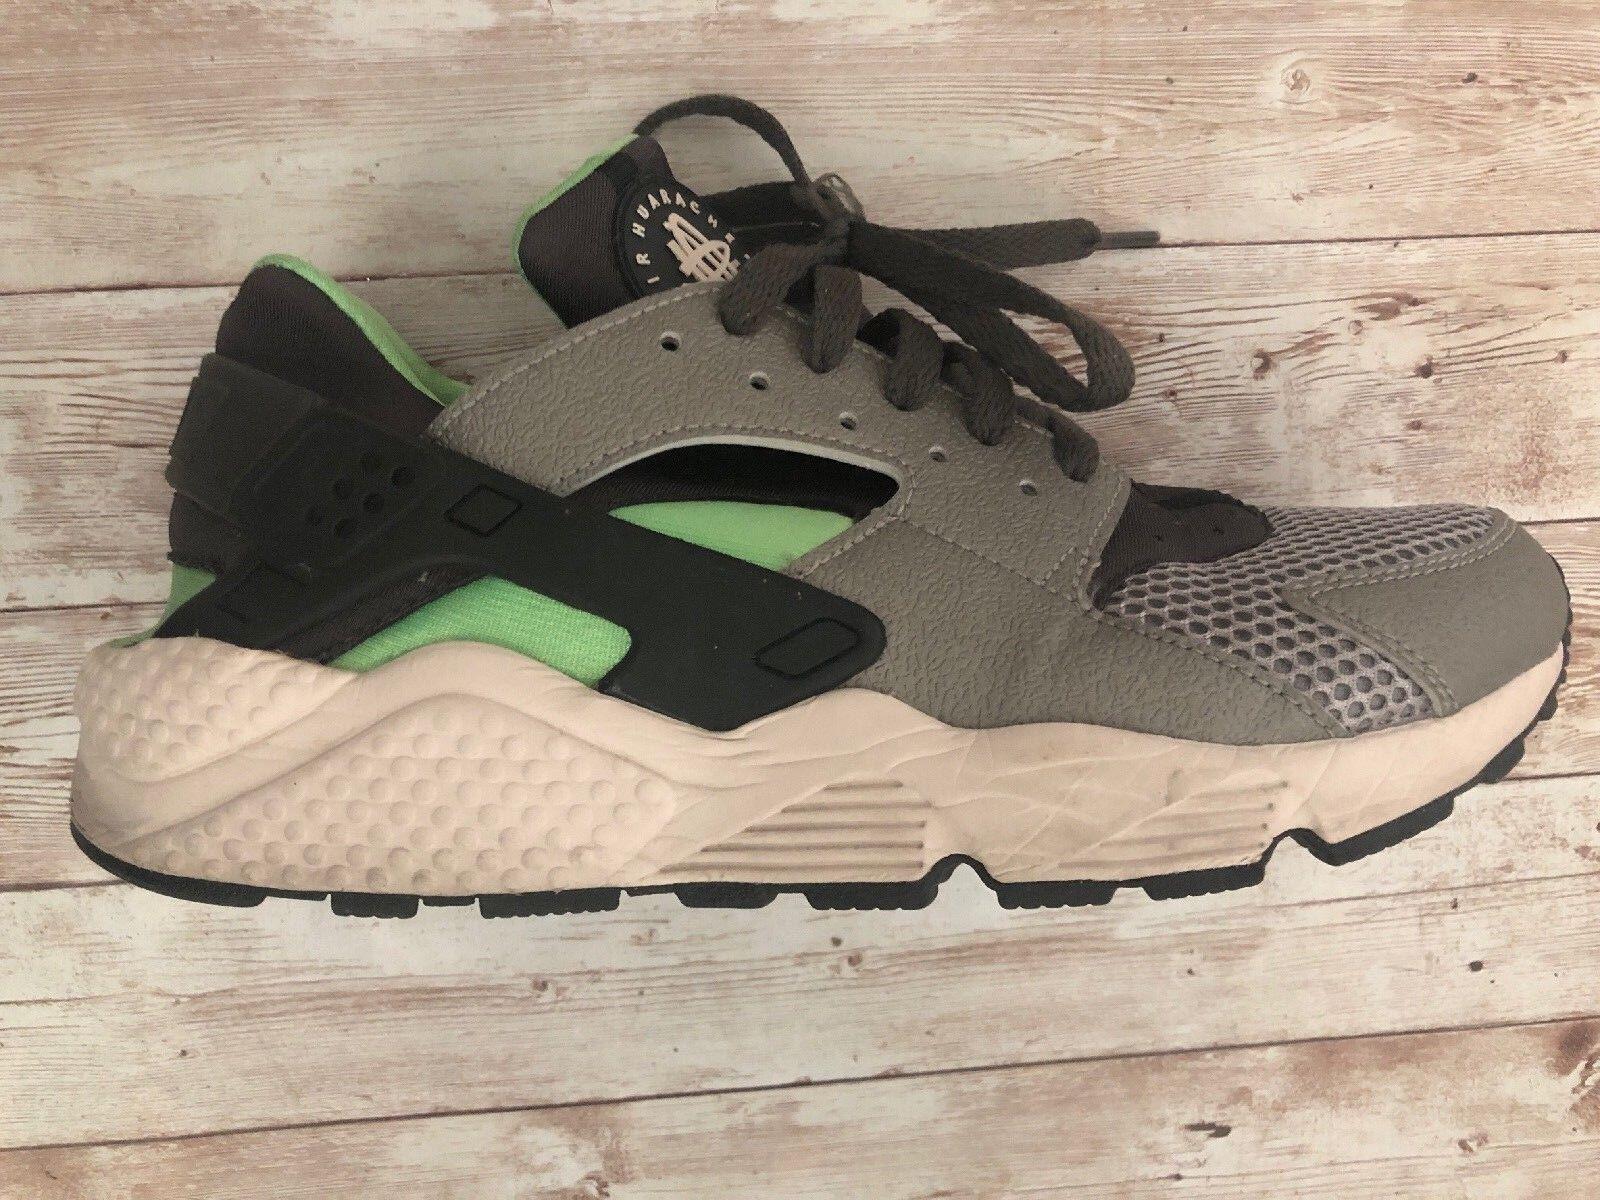 Nike air huarache 318429-013 männer - größe 8